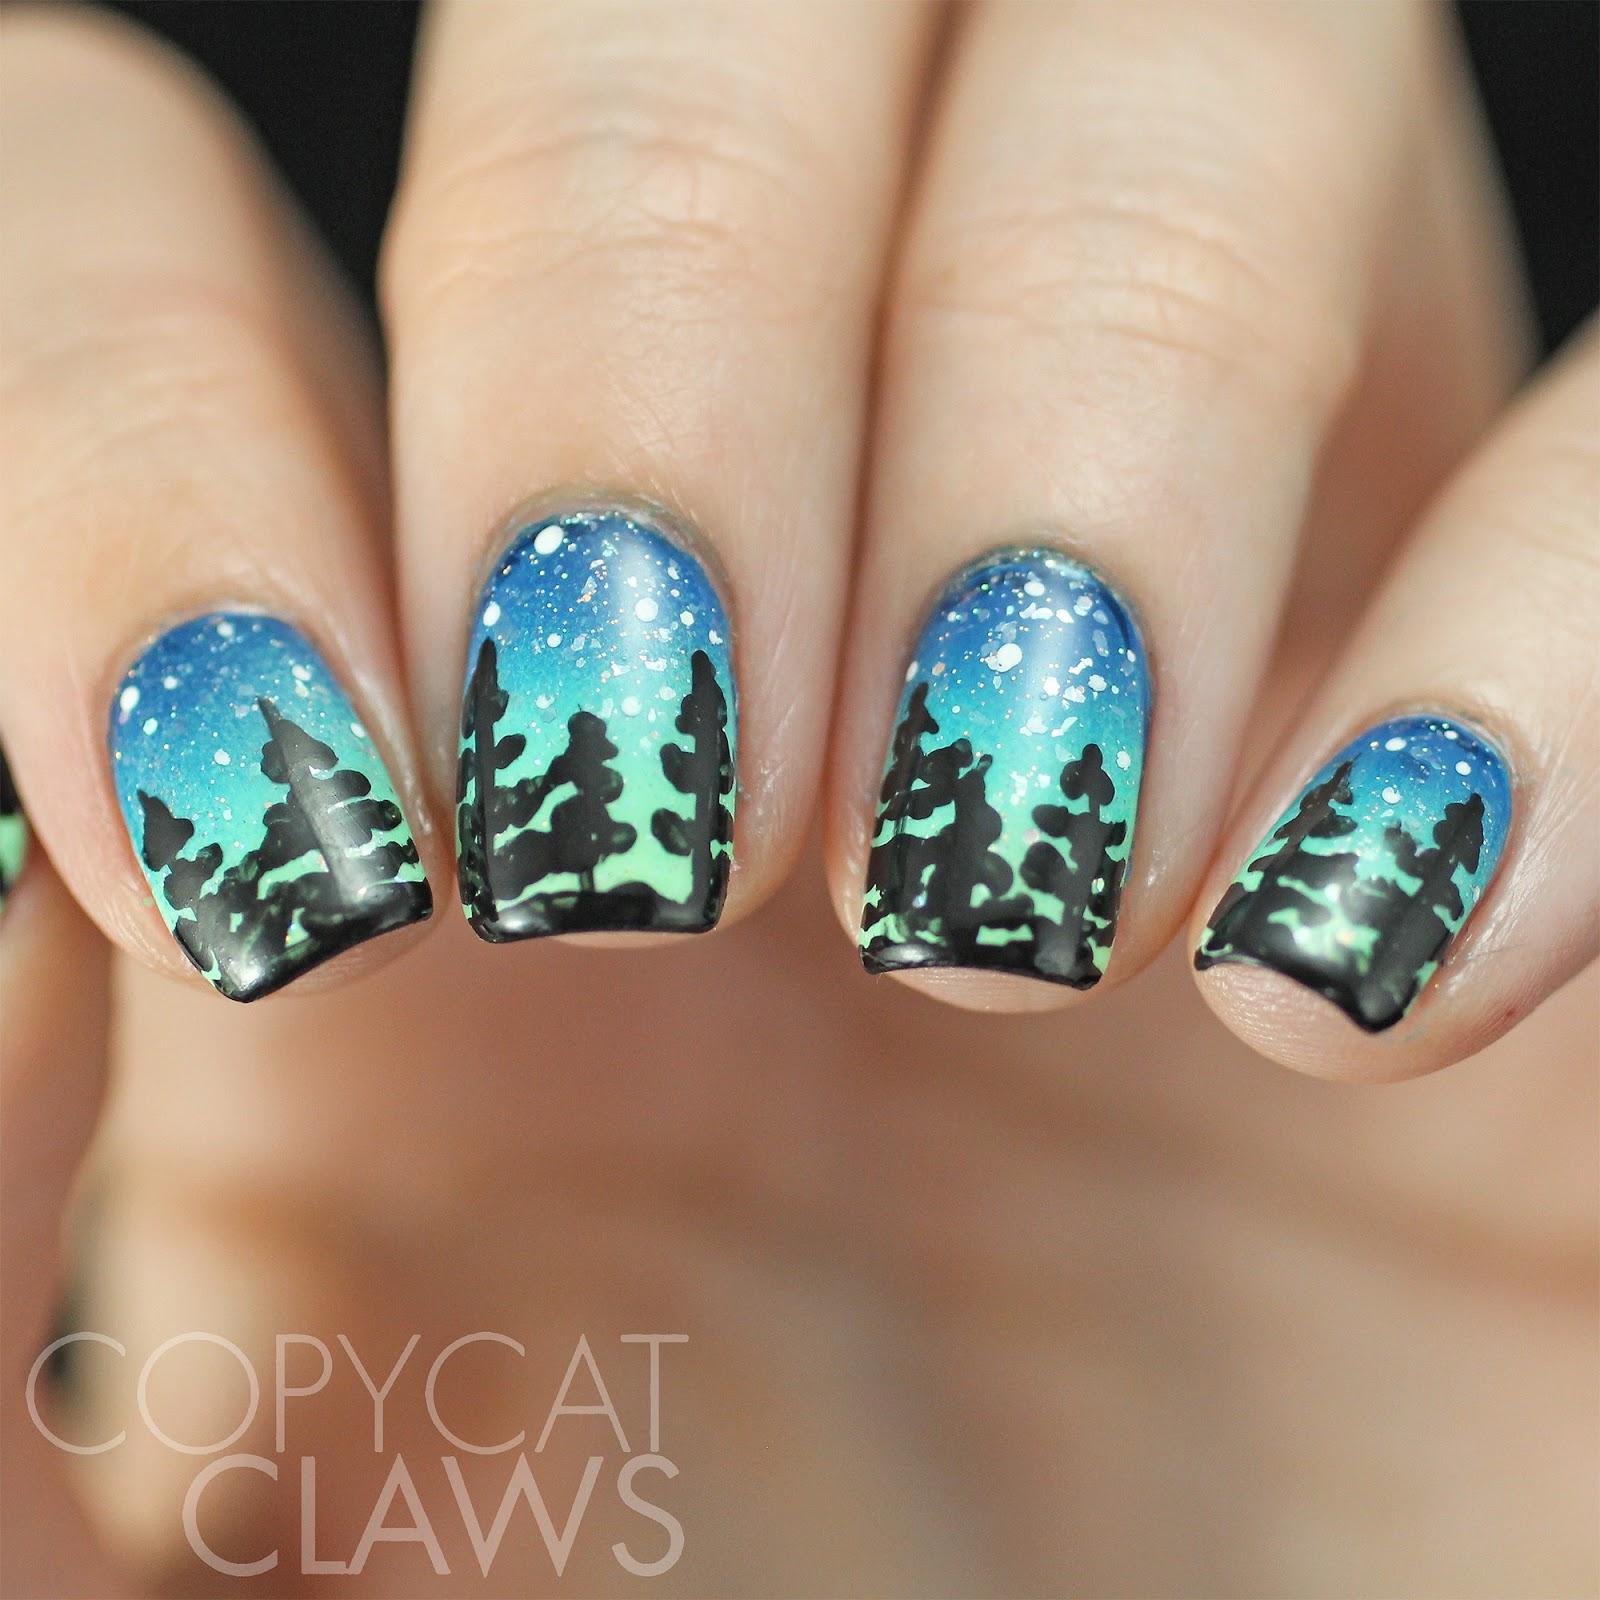 Copycat Claws: HPB Presents Northern Lights Gradient